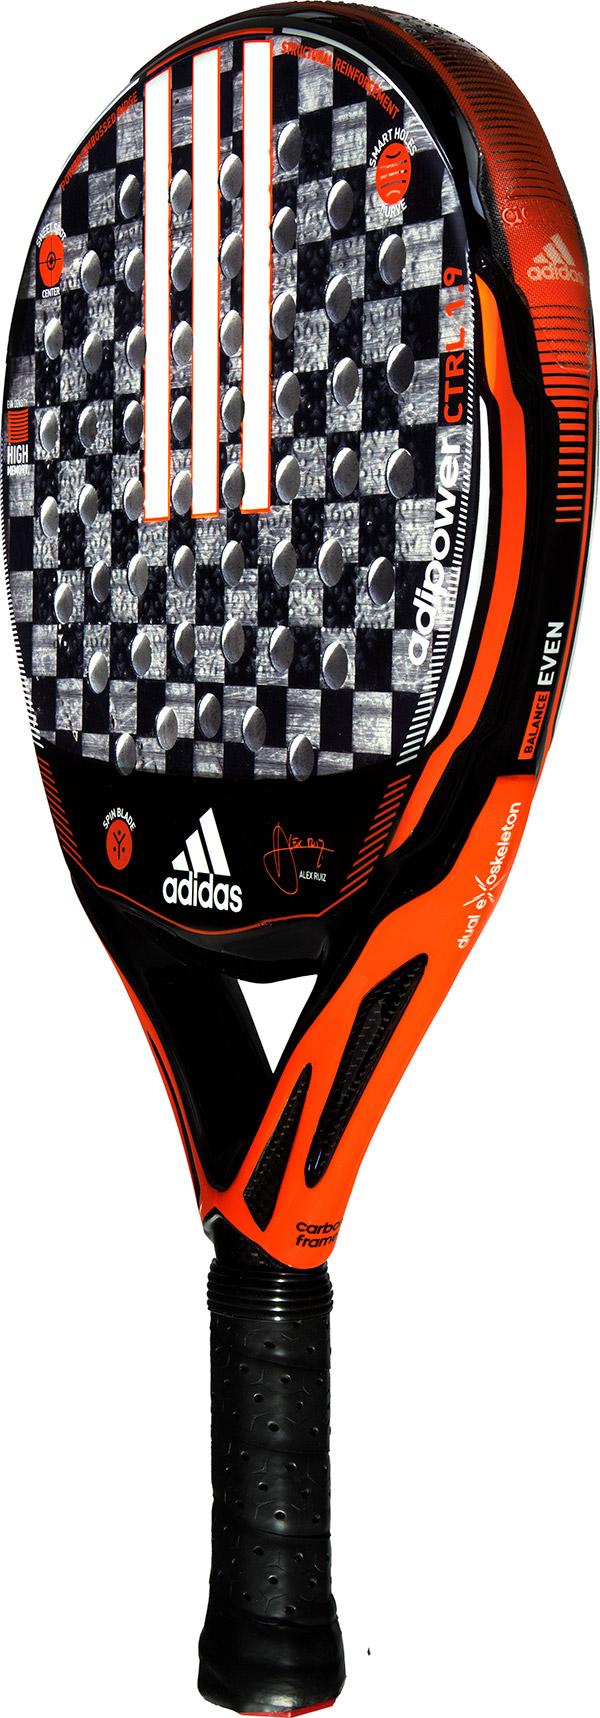 1 Padel Adidas Control 9 Adipower 4A5jLR